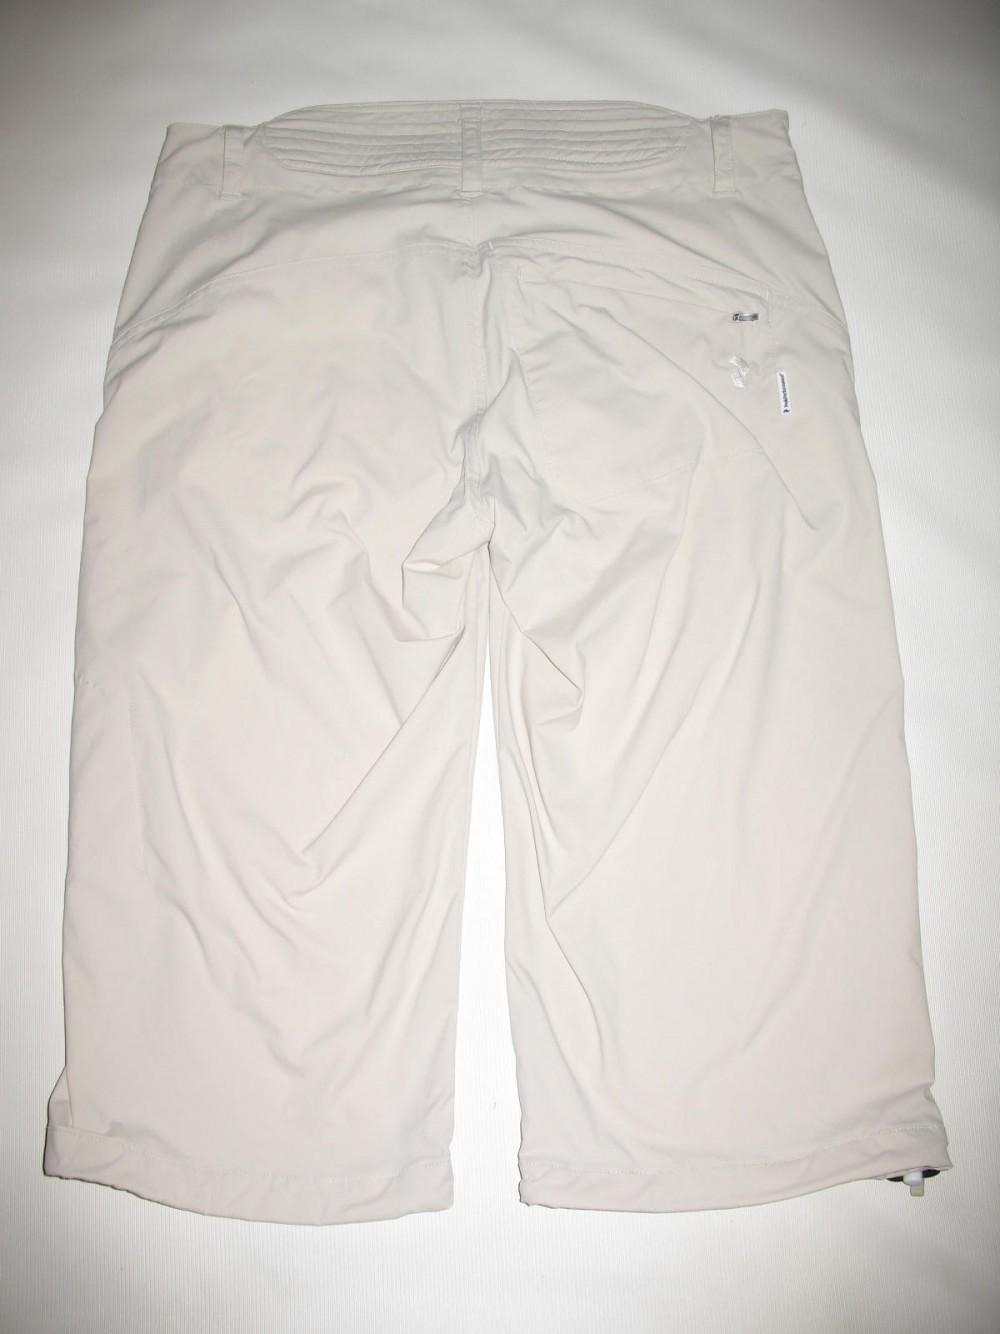 Шорты PEAK PERFOMANCE dexi shorts lady (размер М/L) - 1